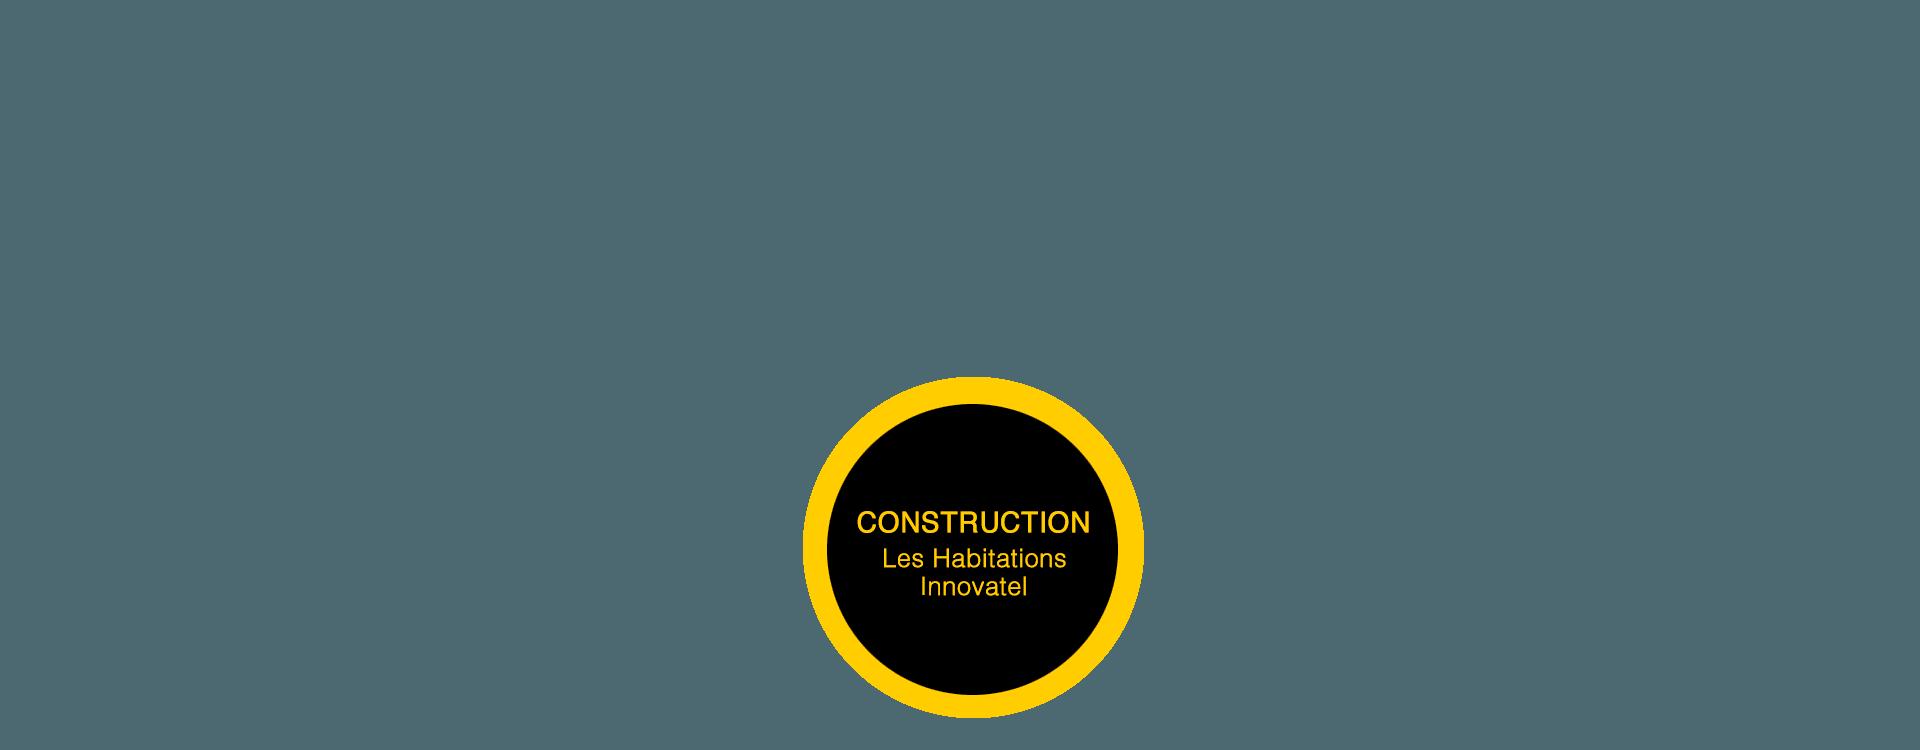 Domaine Ancestra construction des habitations Innovatel